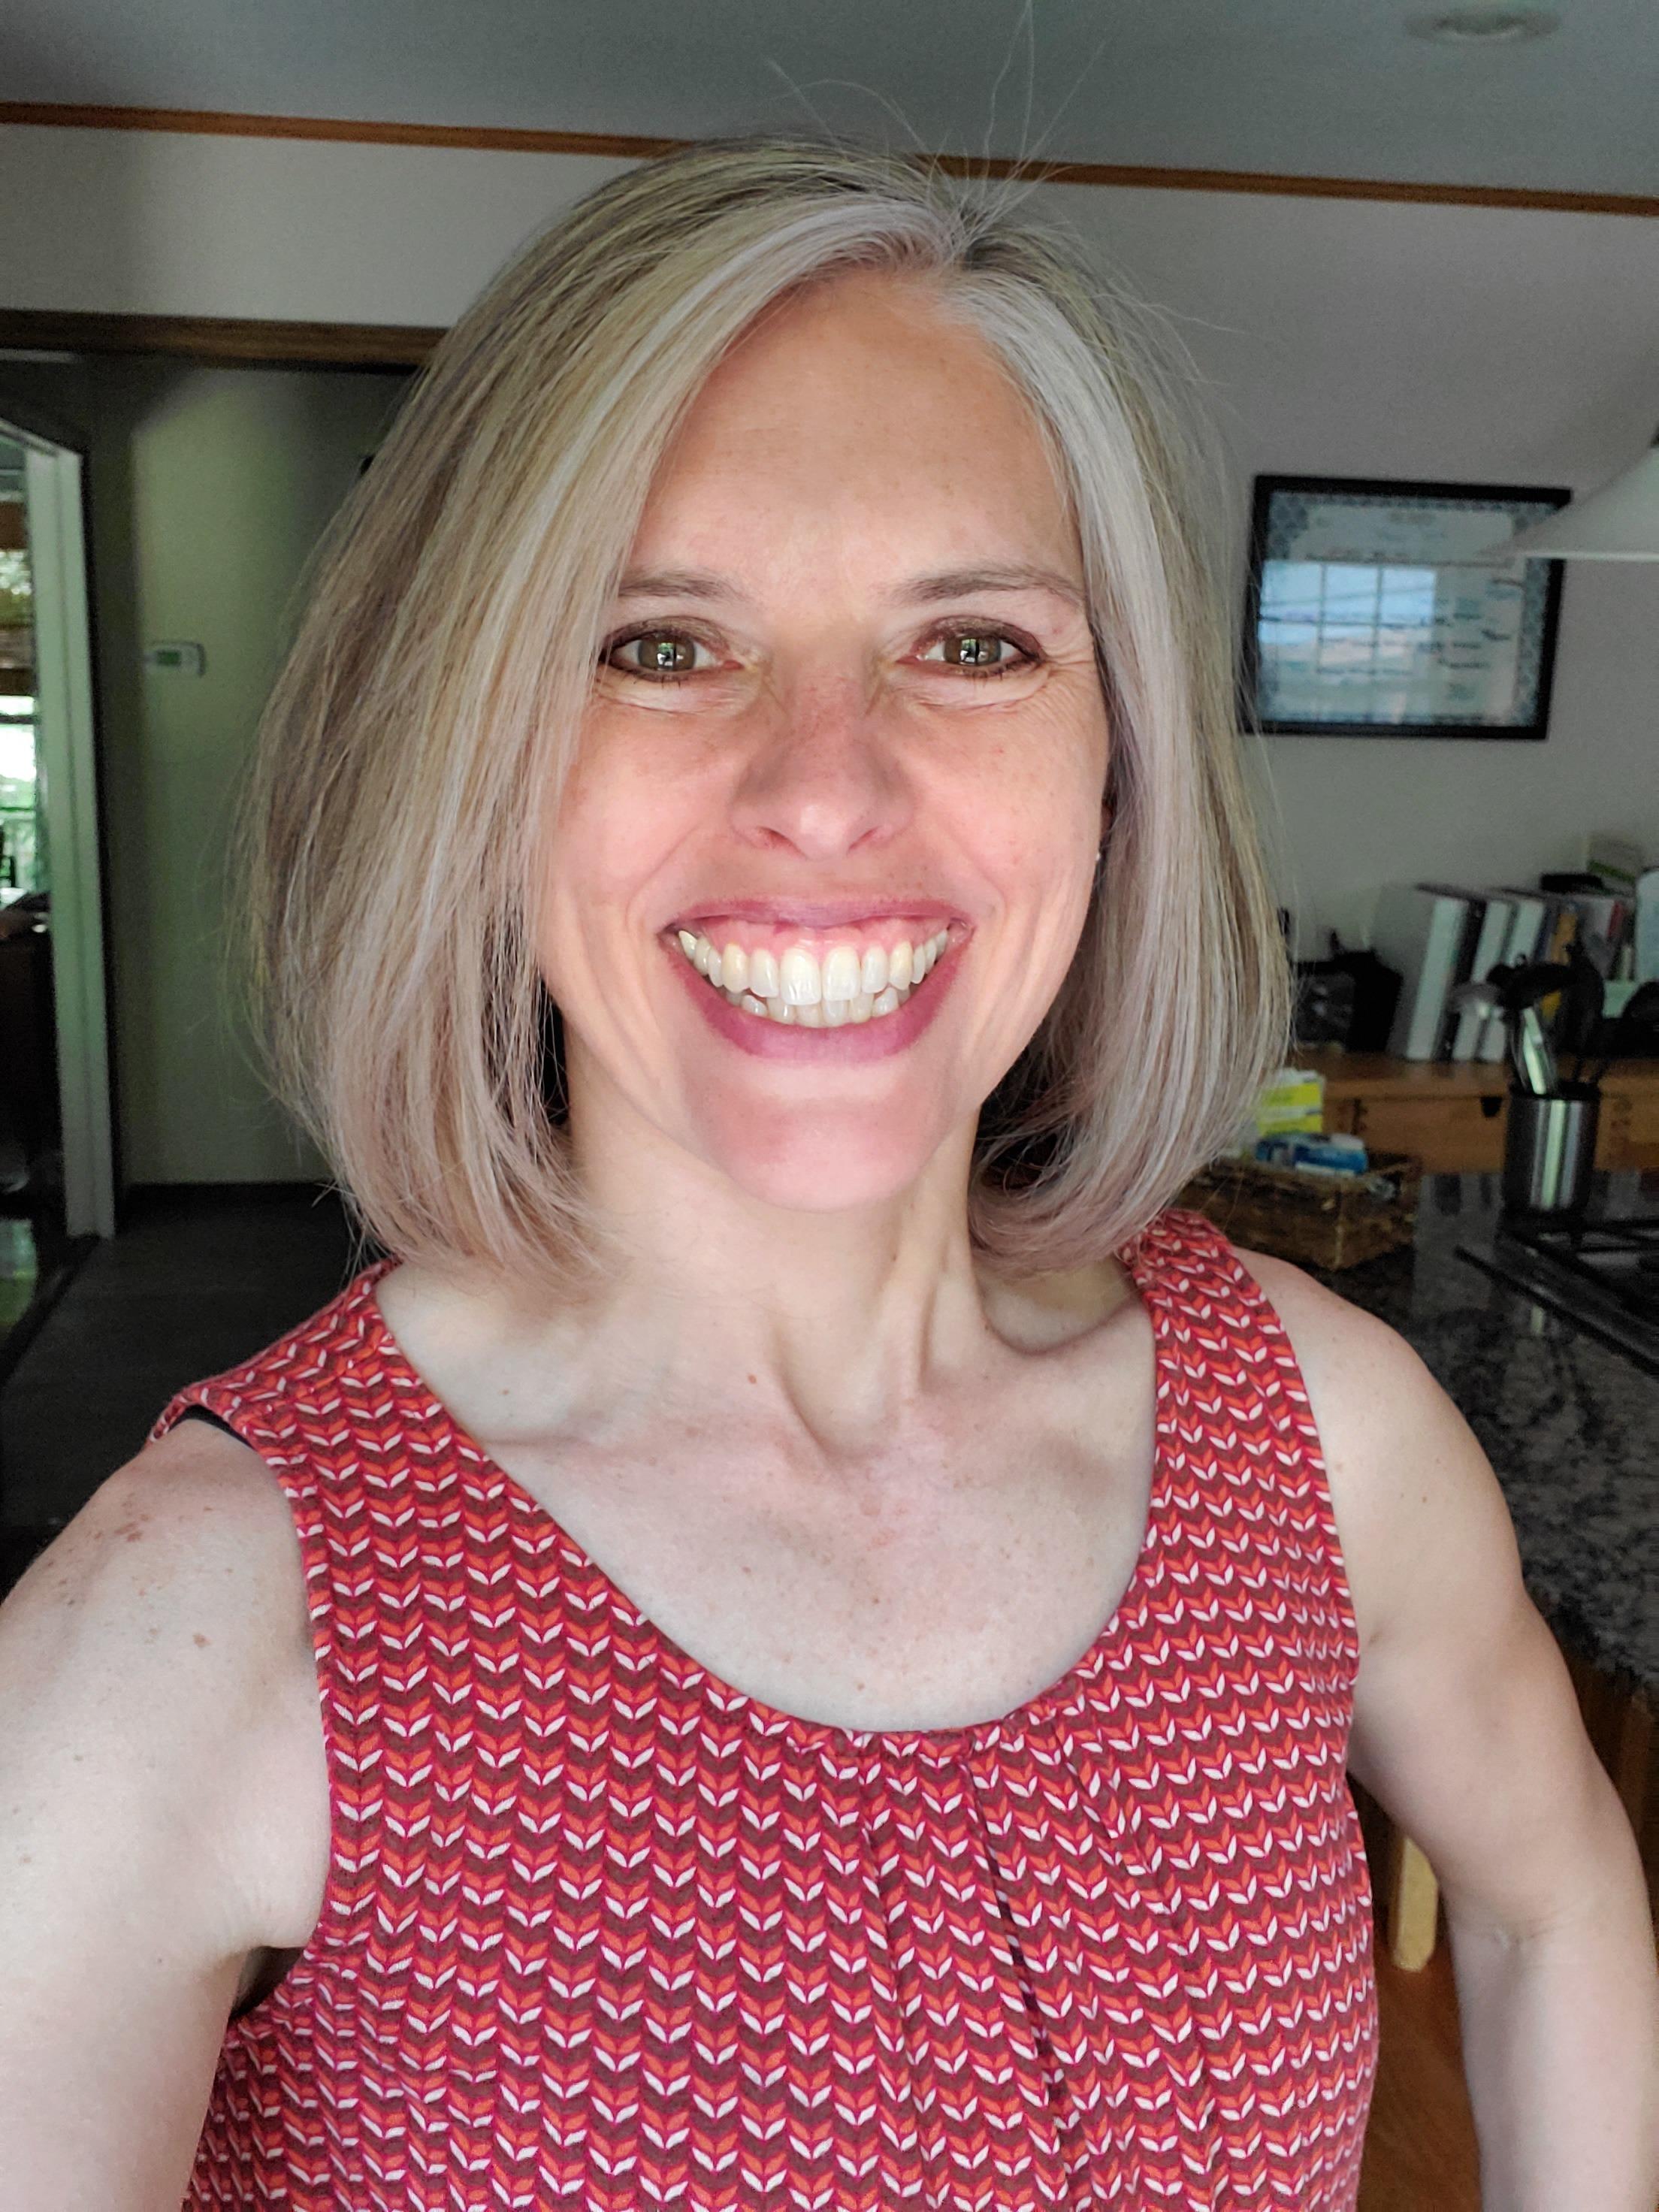 Tutor Holly Charlotte NC - Academic Coaching.jpg